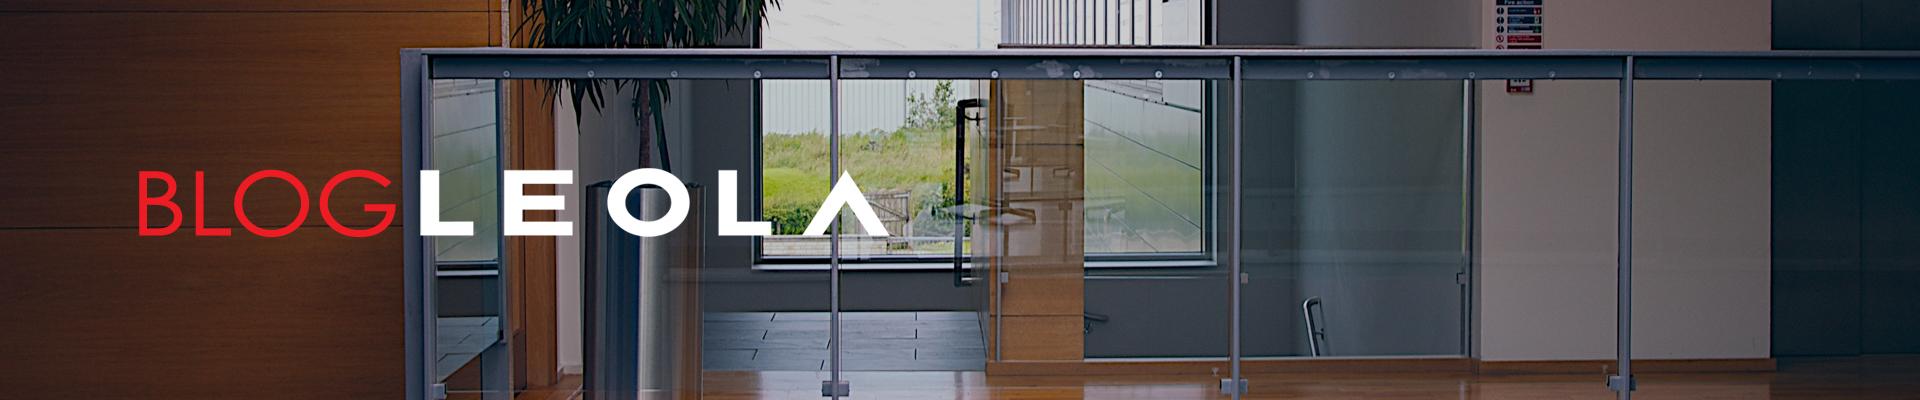 Blog - LEOLA Commercial Inc.